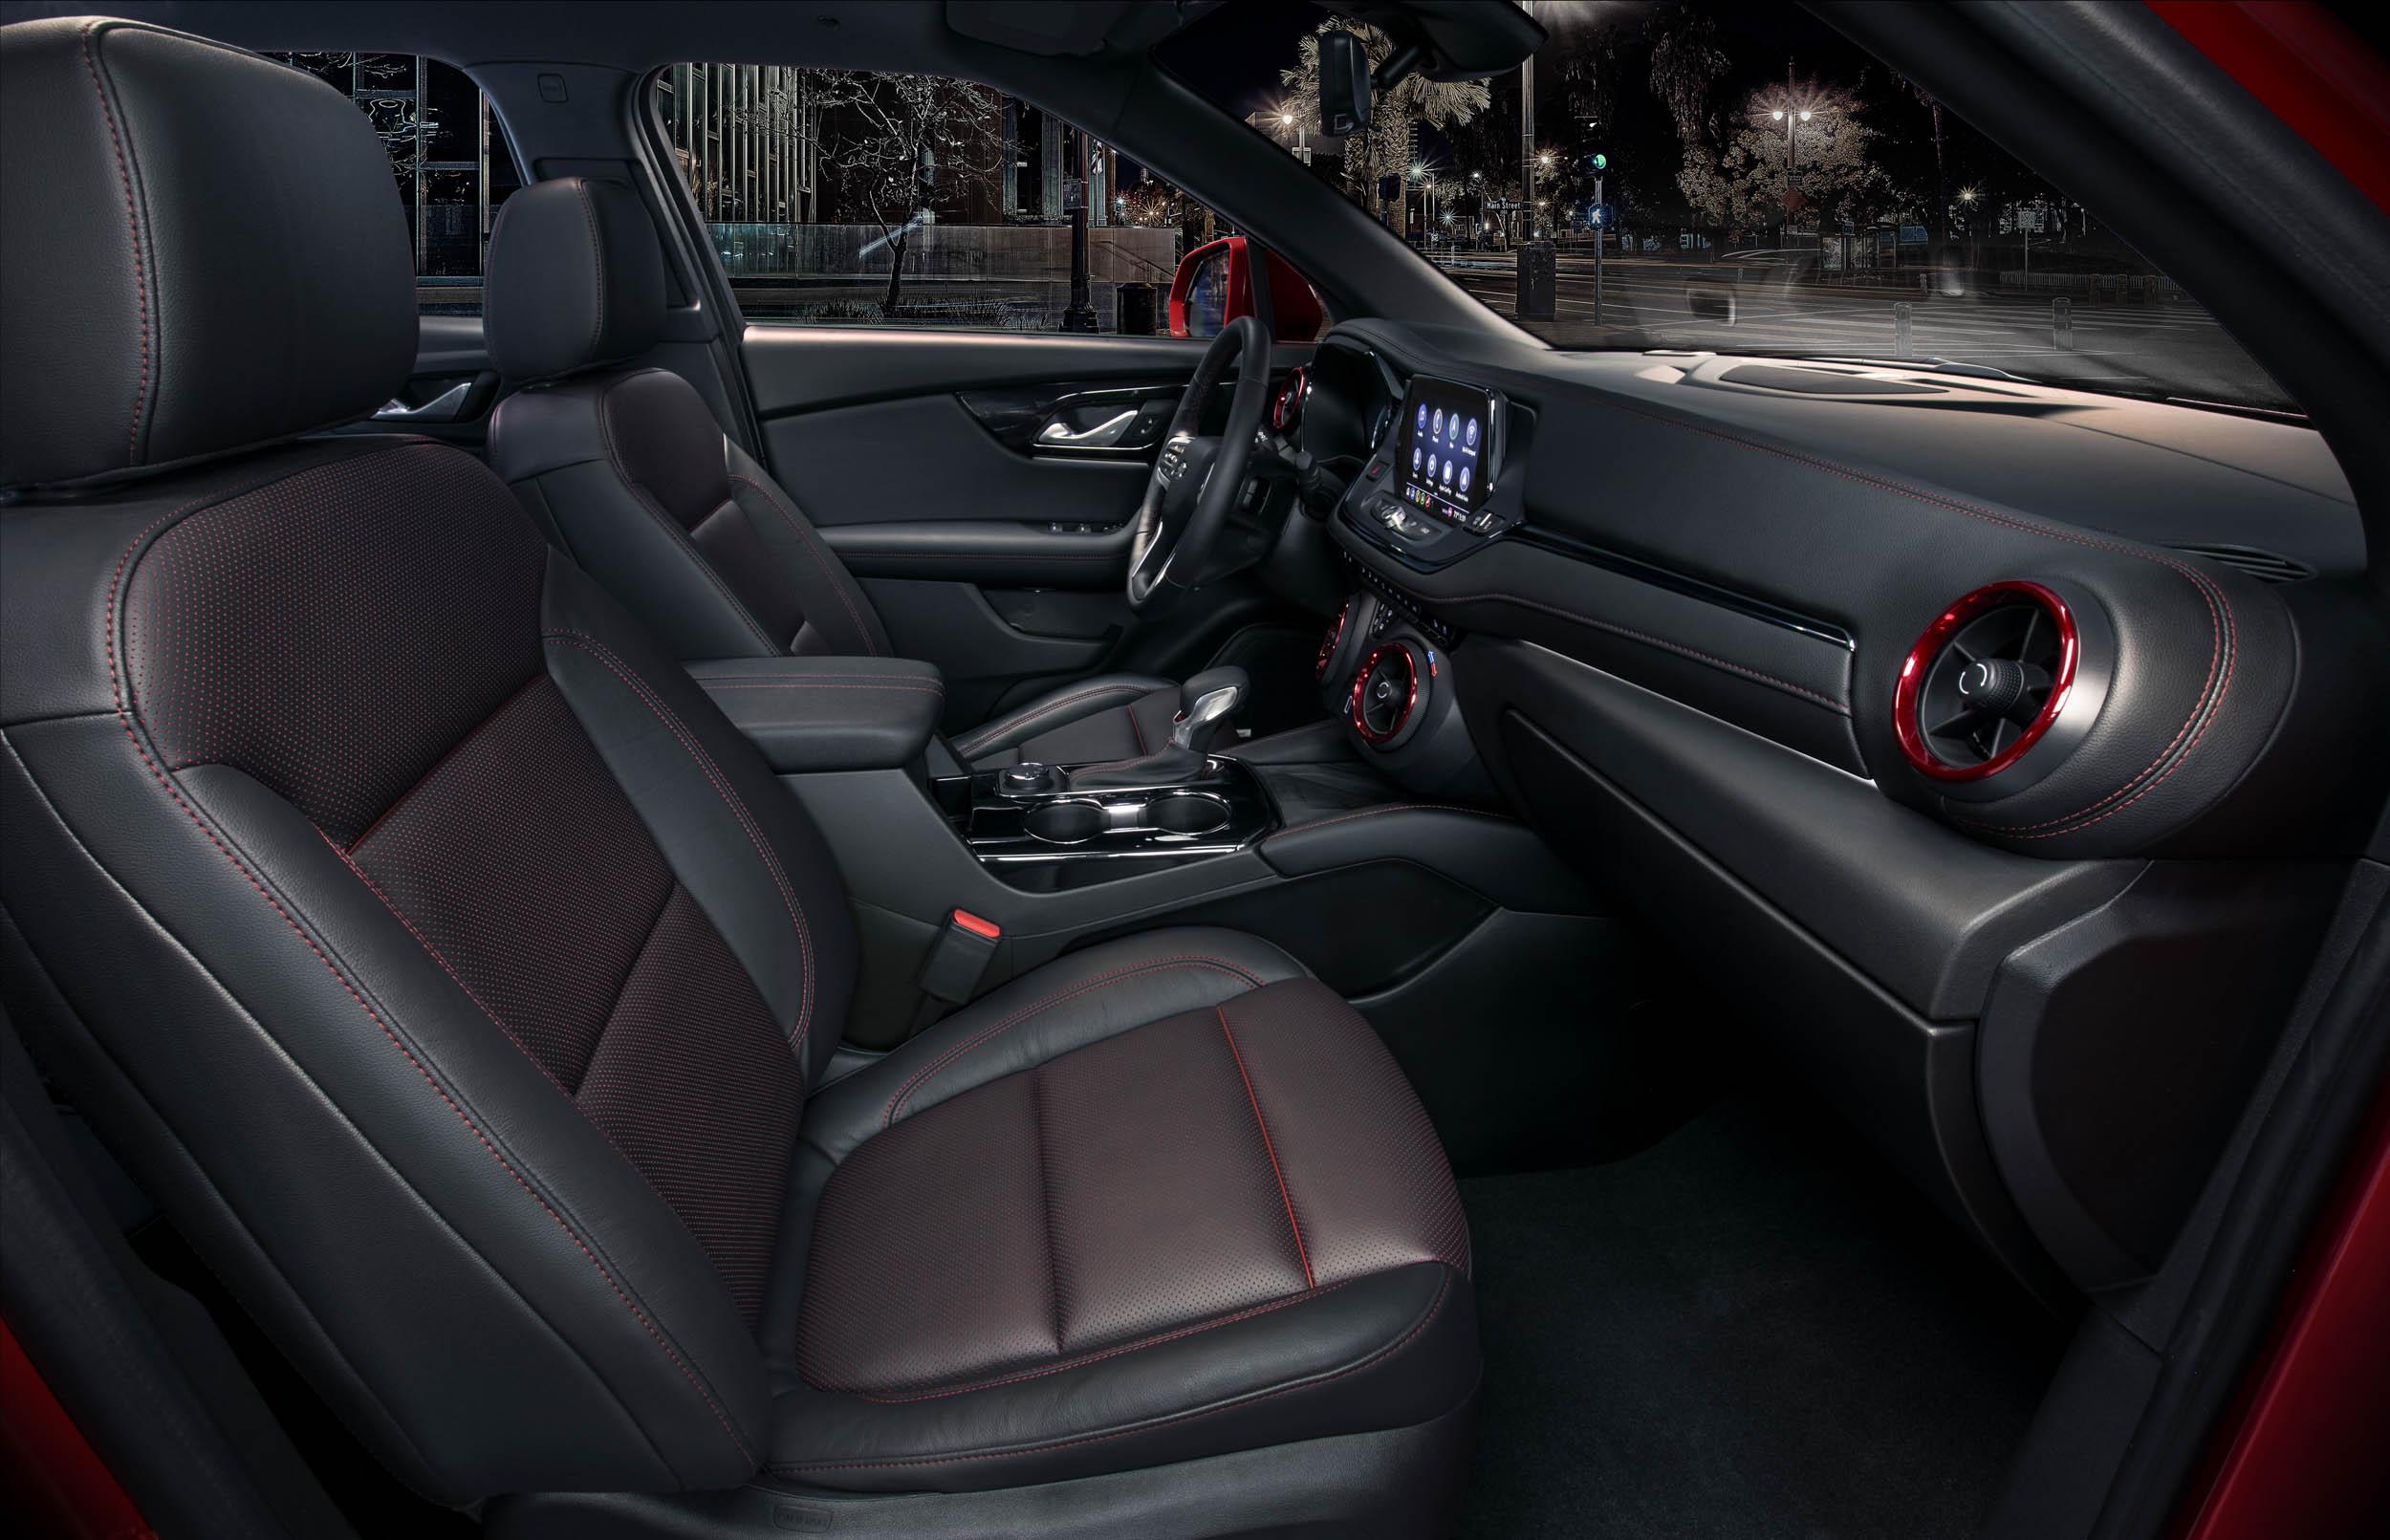 2019 Chevrolet Blazer passenger interior